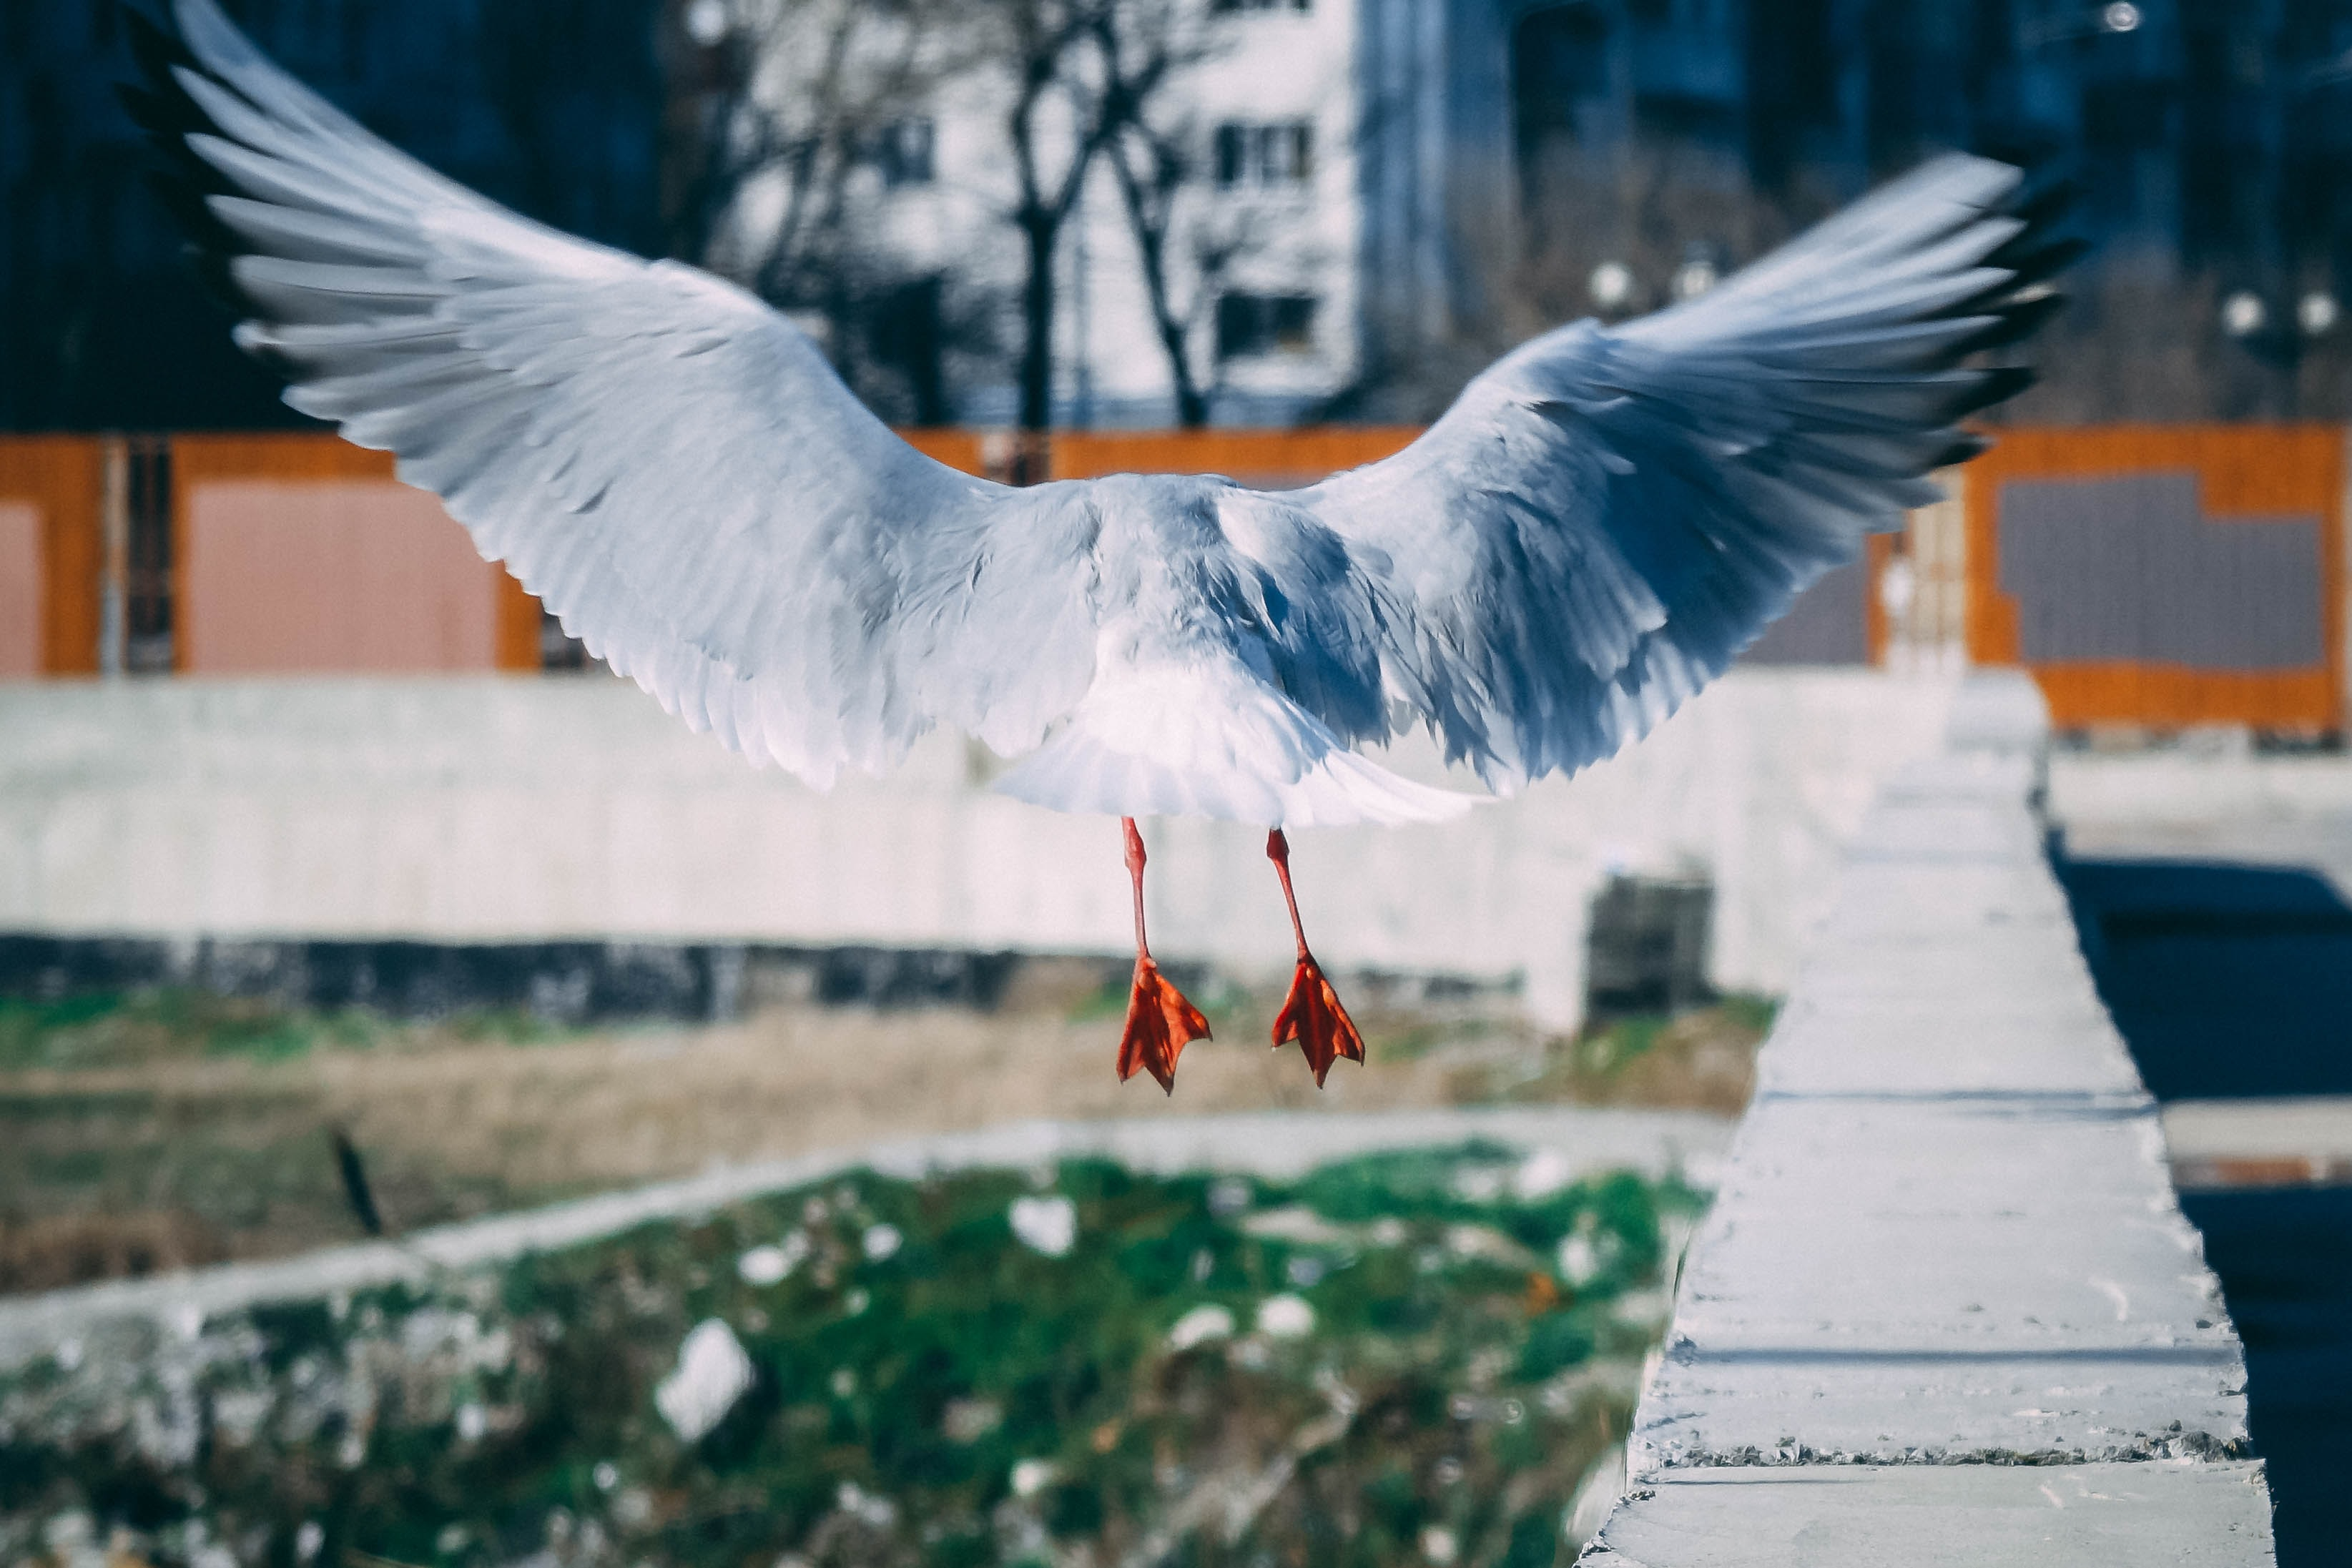 white bird flying near concrete wall